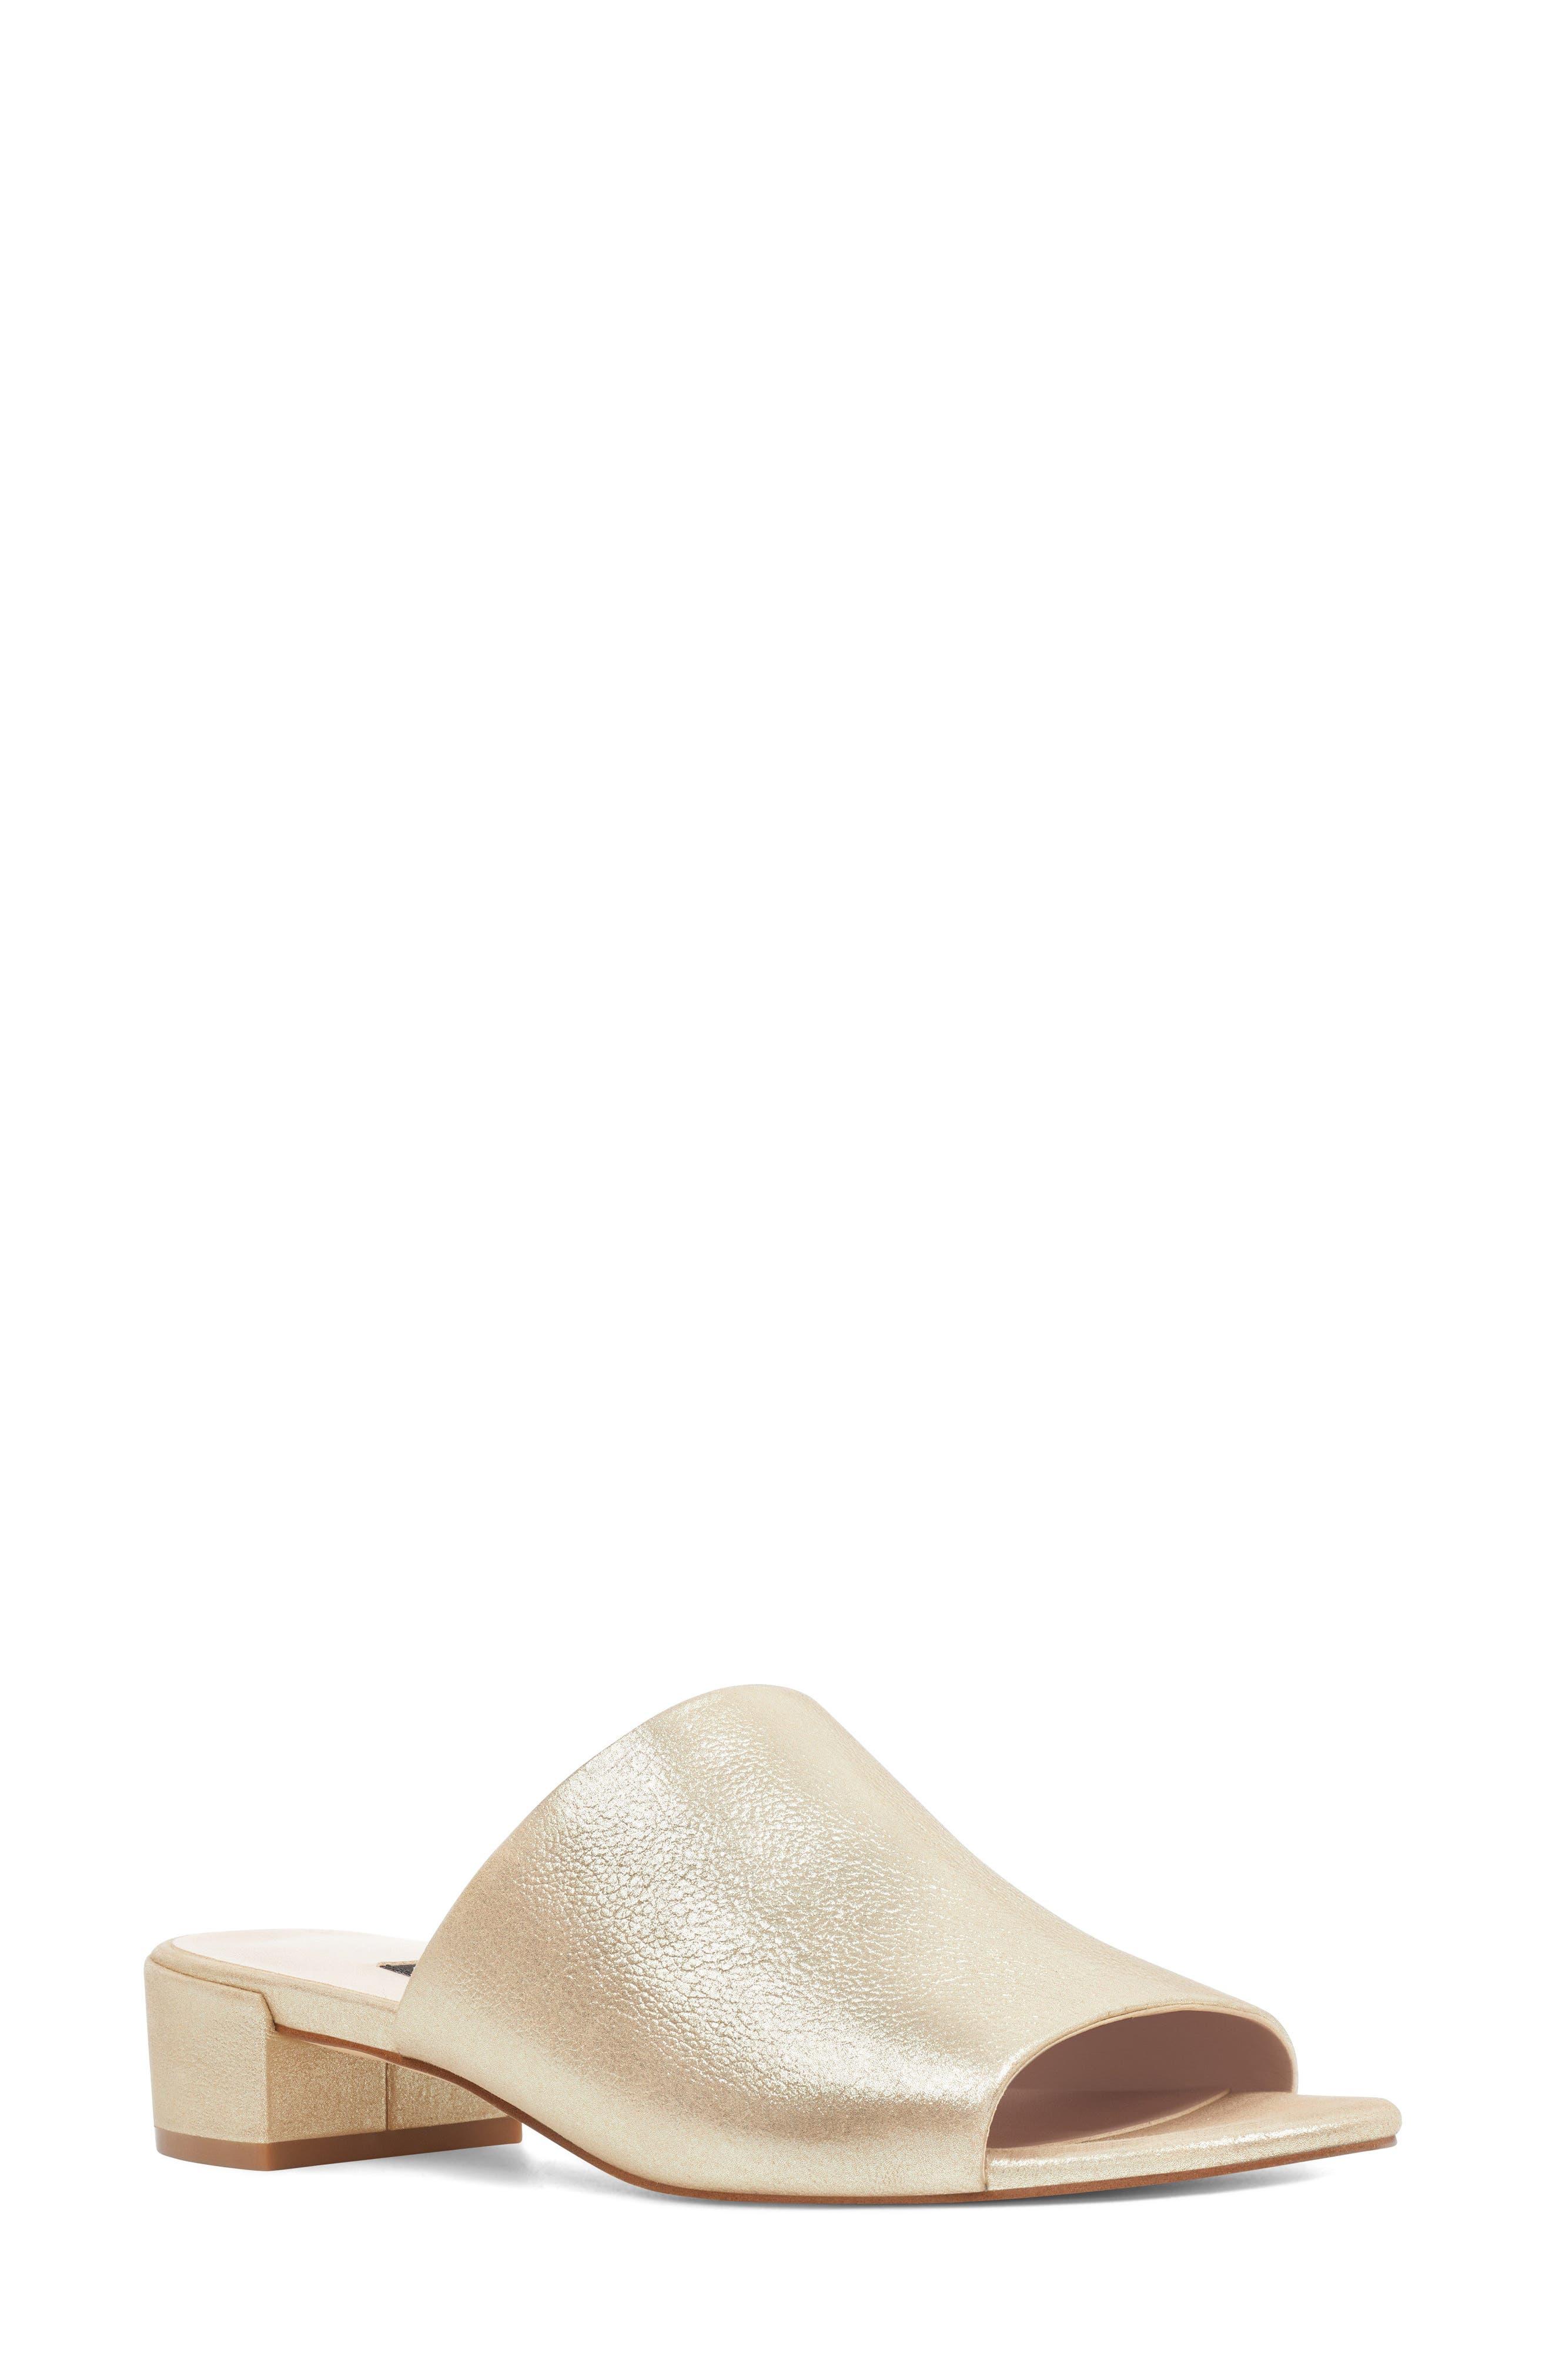 Raissa Slide Sandal,                             Main thumbnail 1, color,                             Light Gold Leather